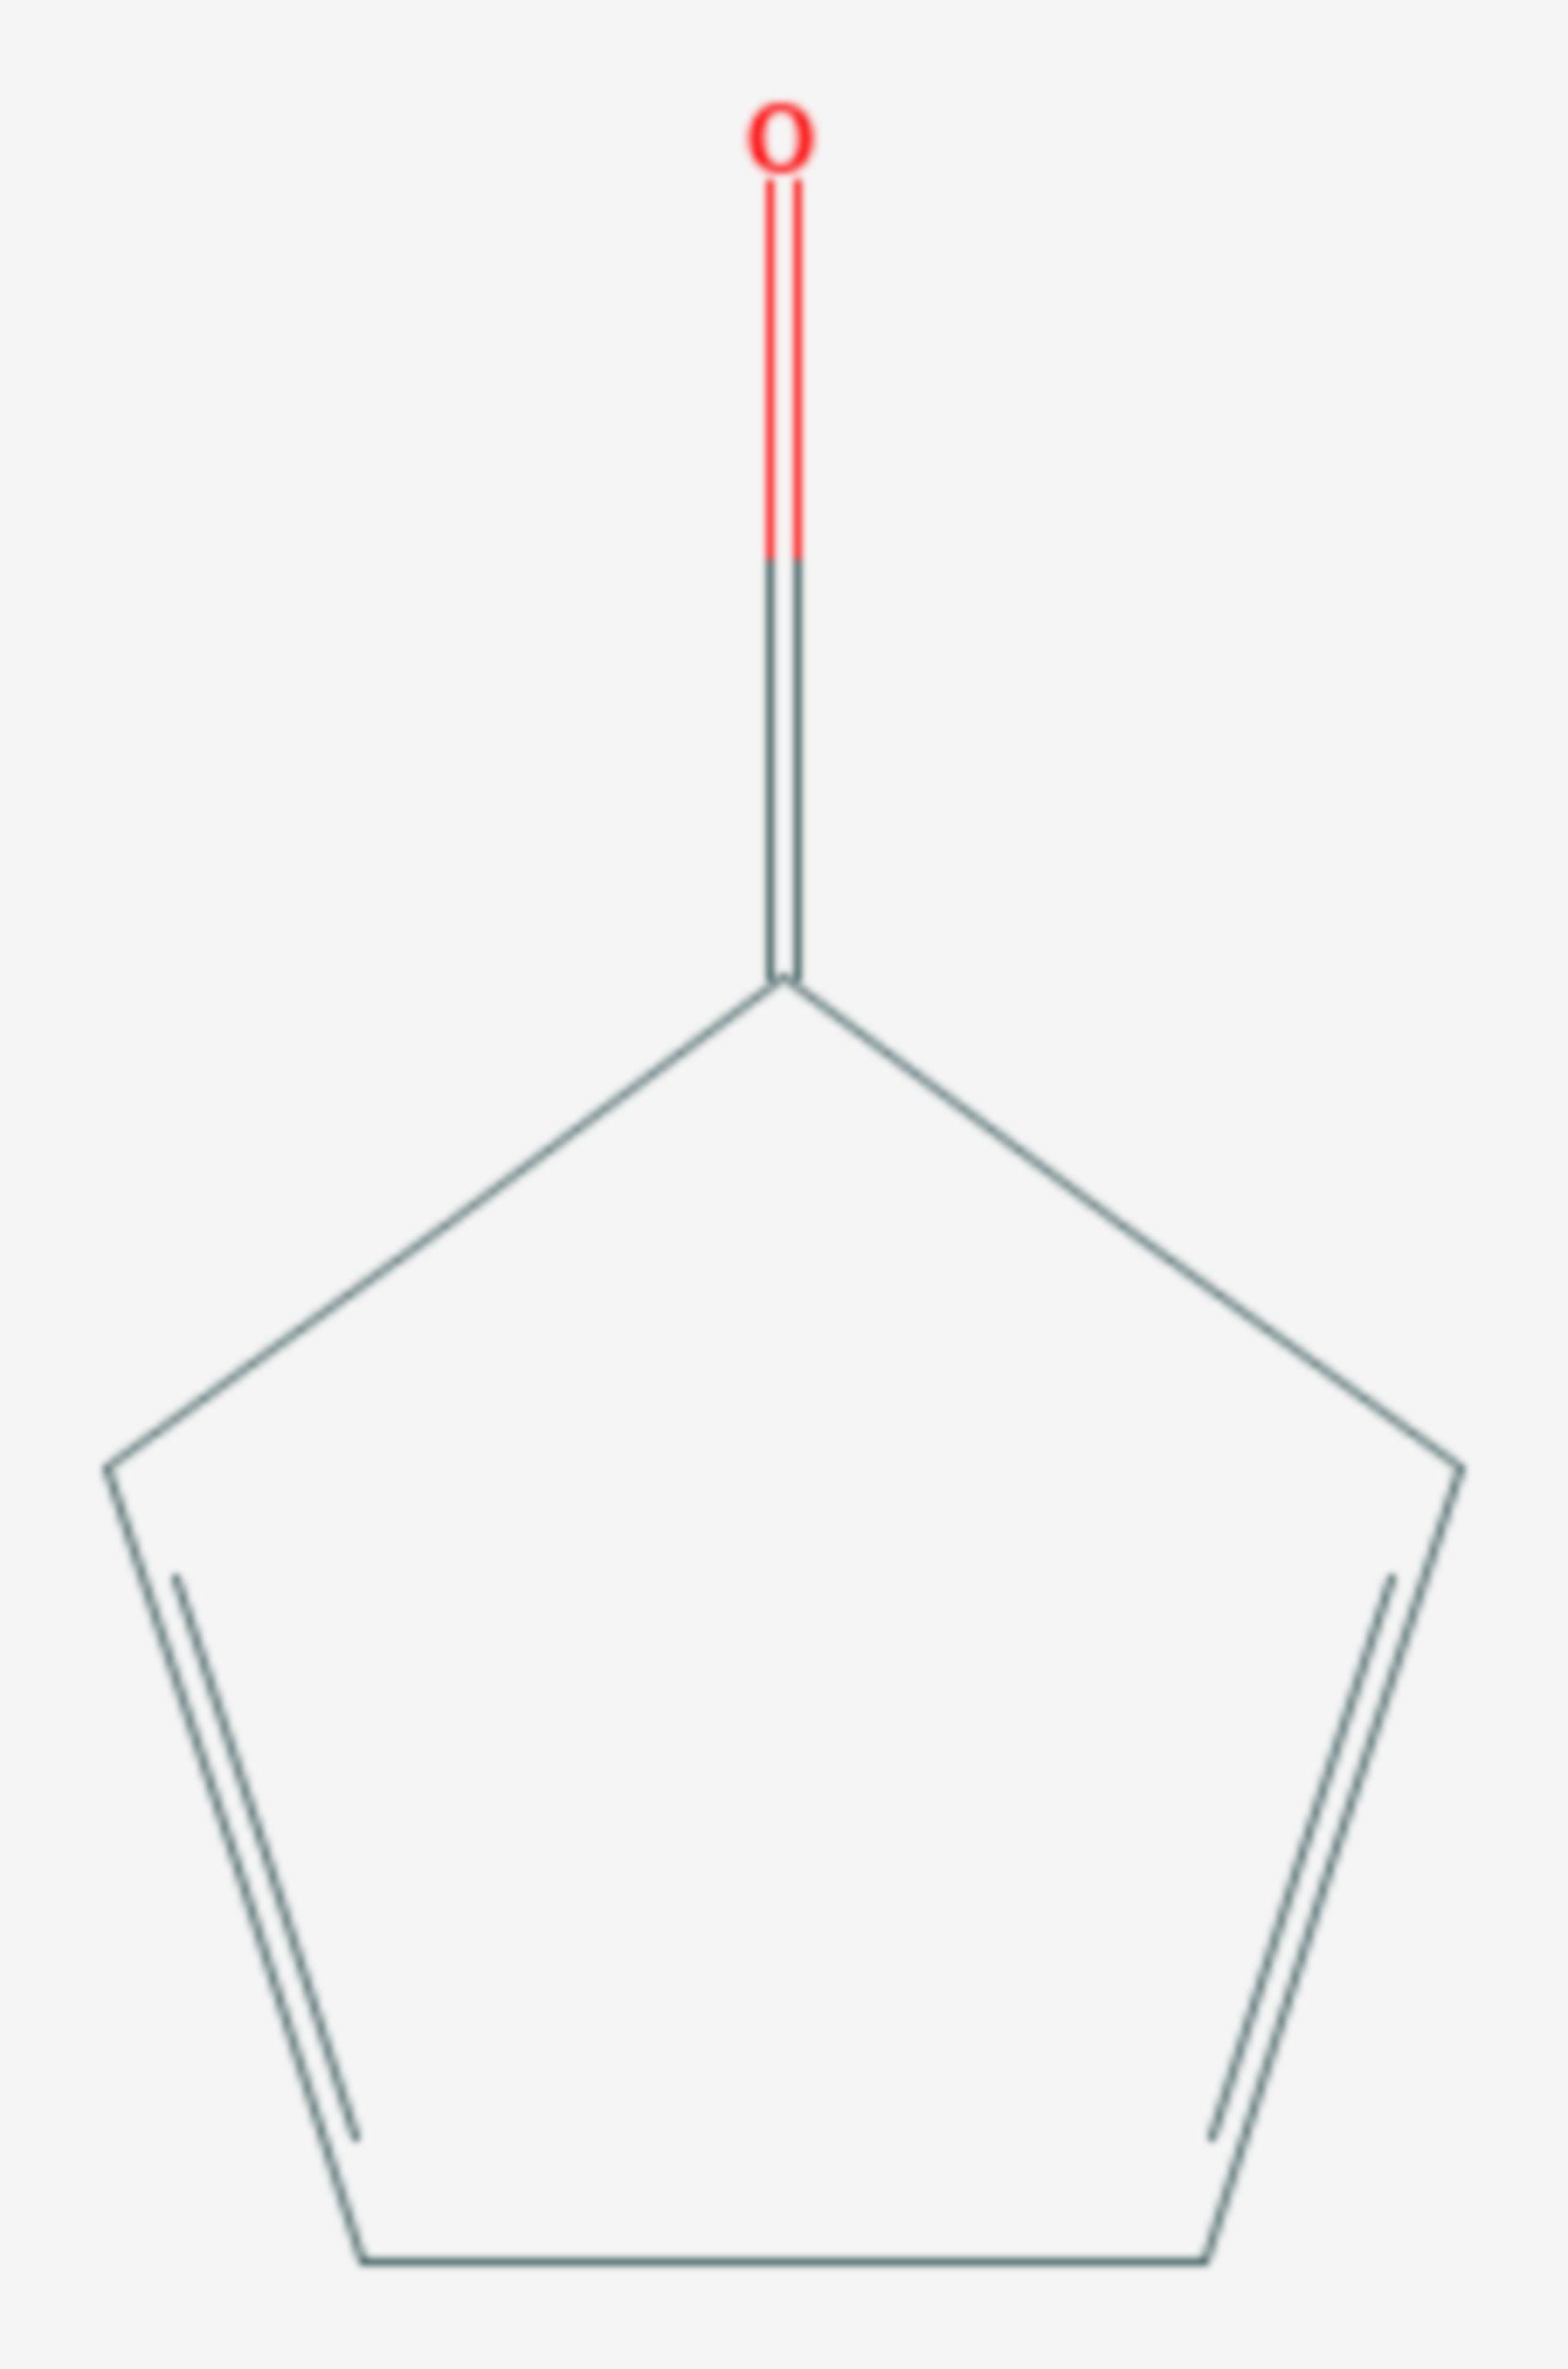 Cyclopentadienon (Strukturformel)